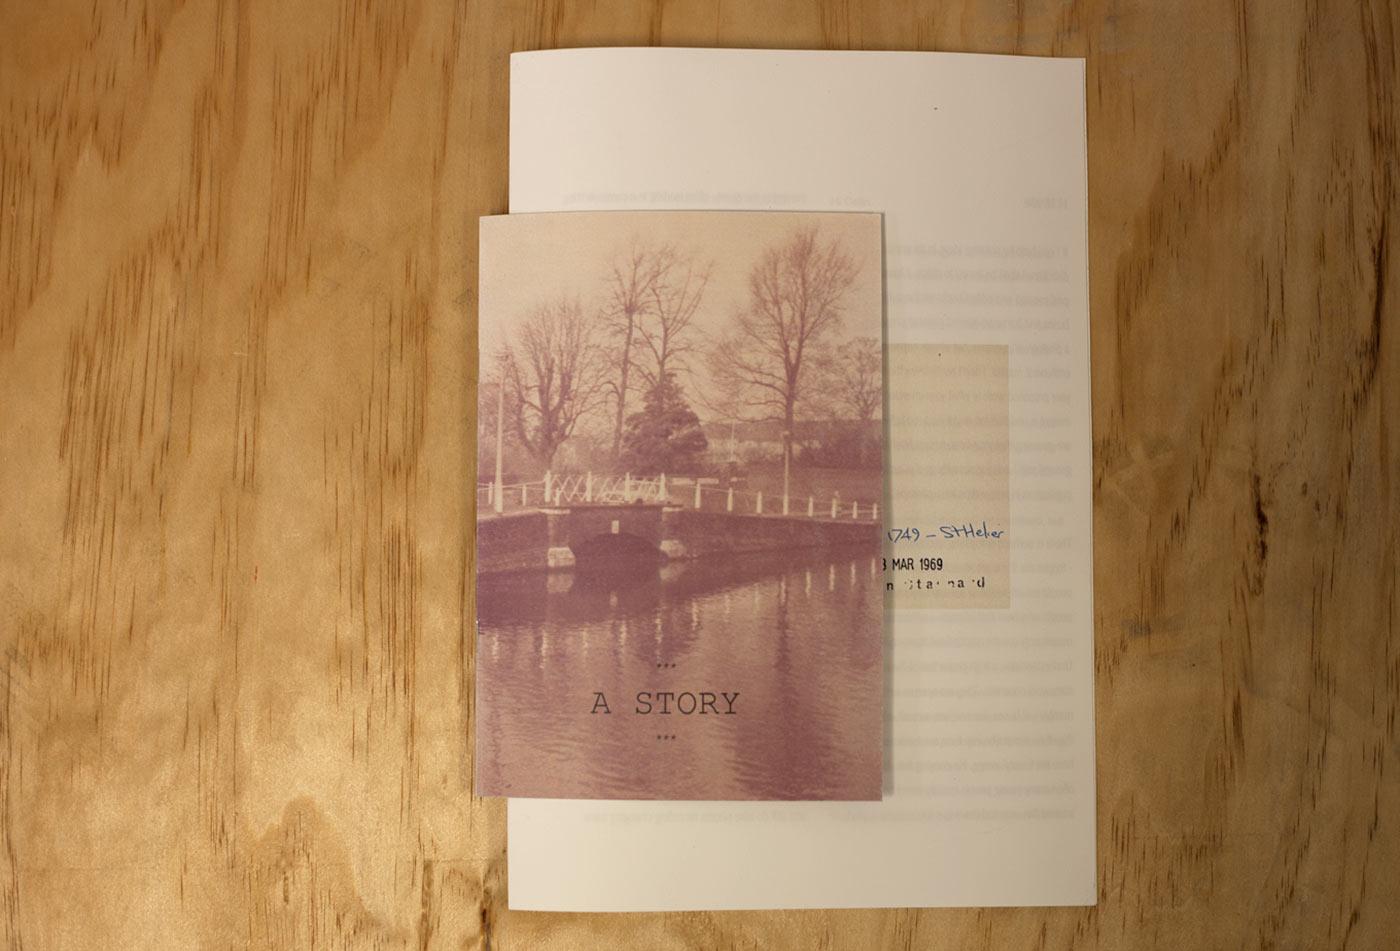 paula-roush-bus-spotting-photobook-msdm-publications-orphan1-51